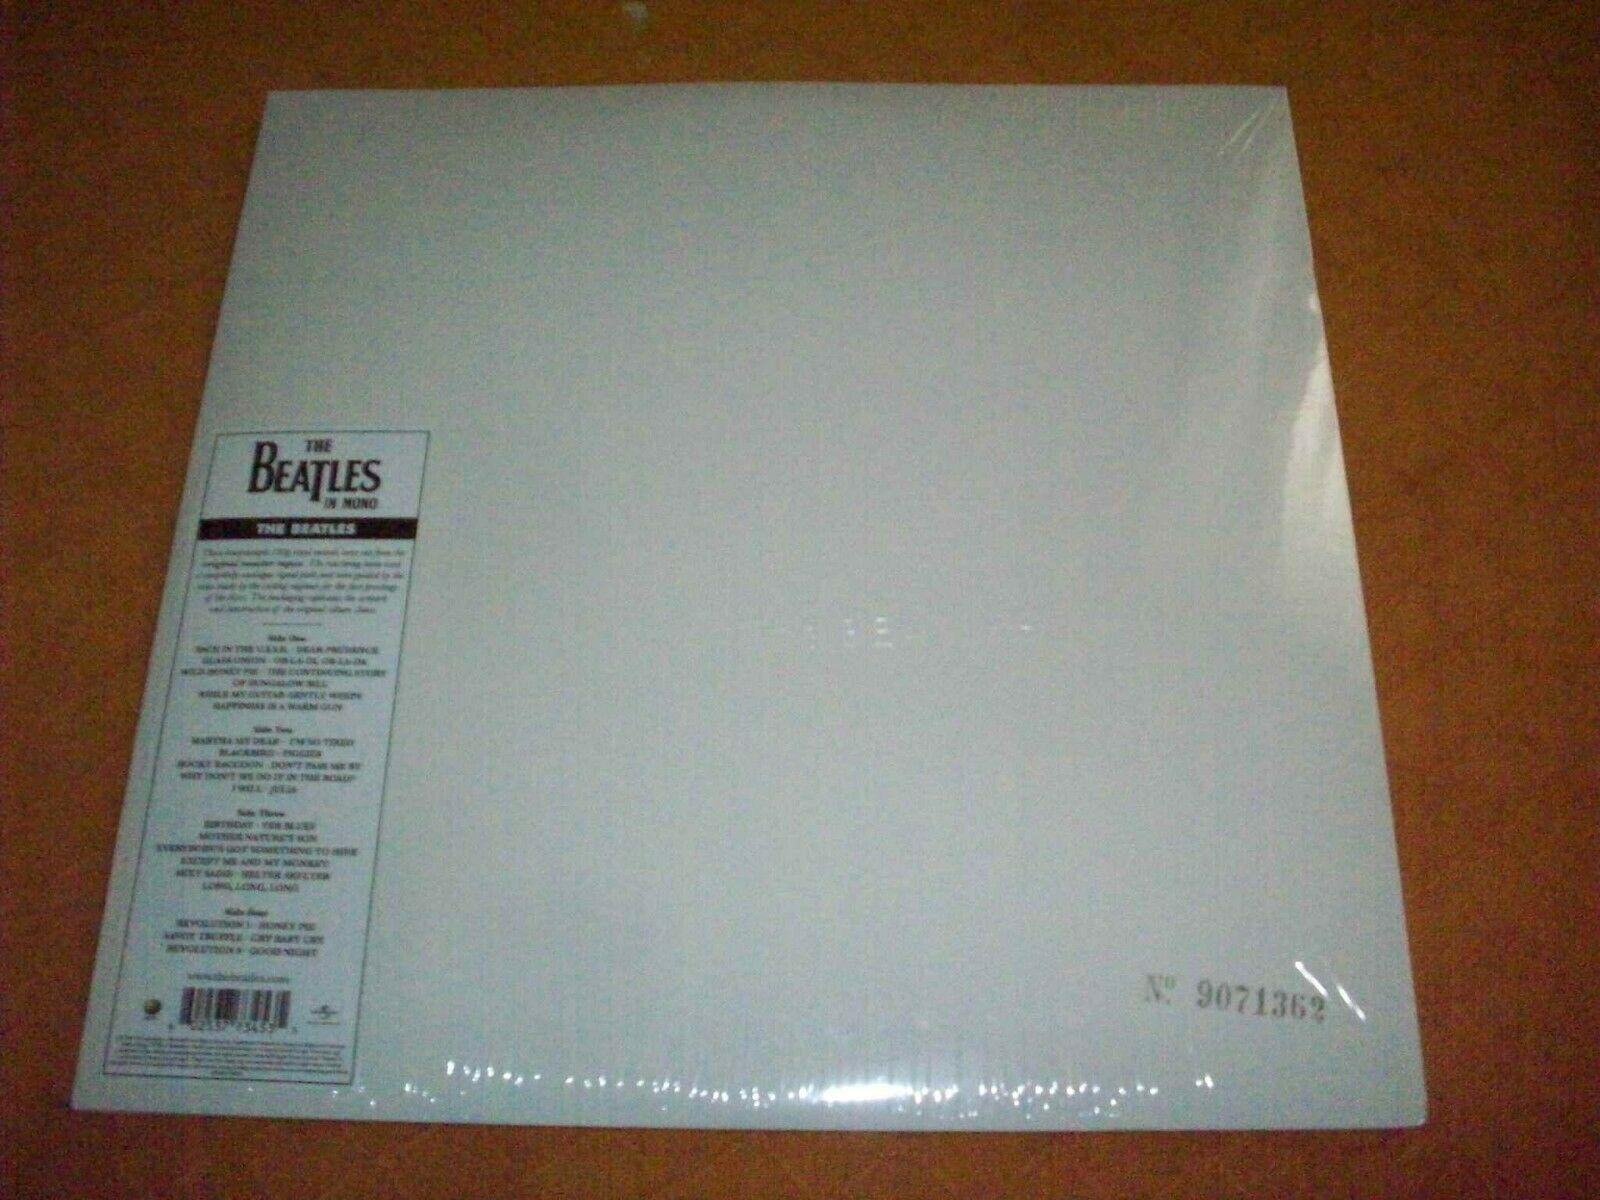 The Beatles, White Album,2014 Apple/EMI. Mono Press. New, Sealed Cond.